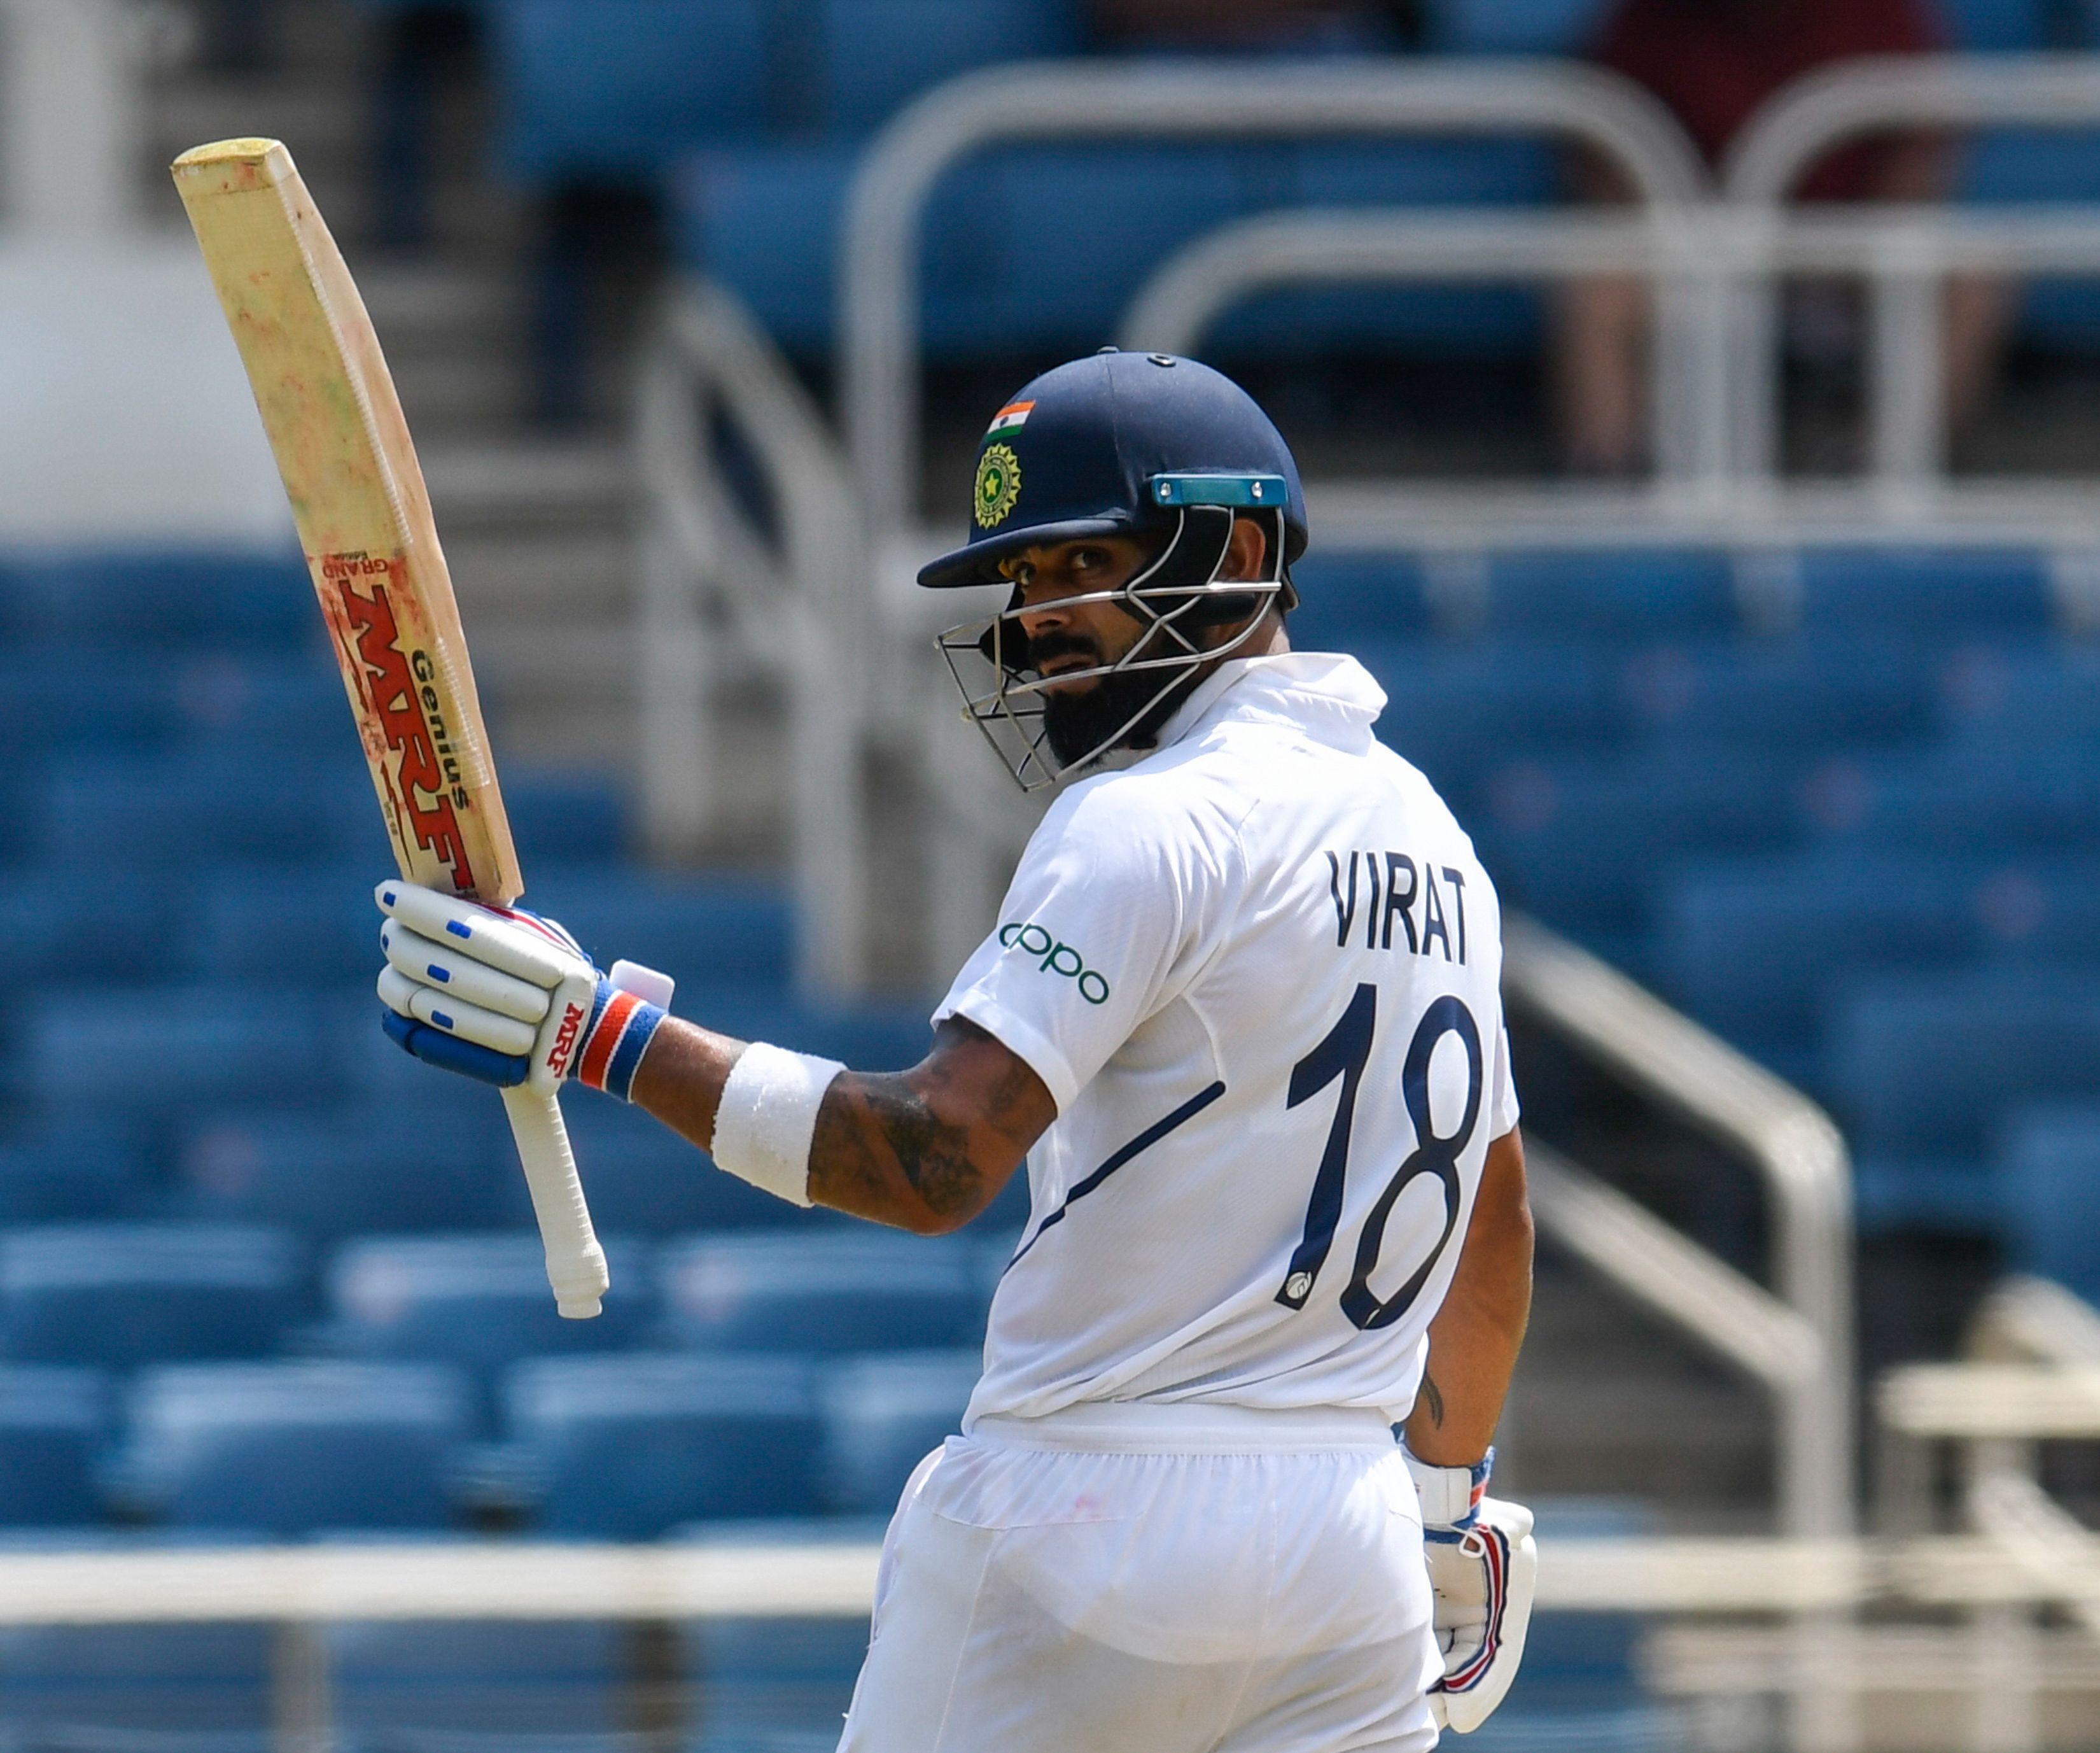 Virat Kohli test cricket